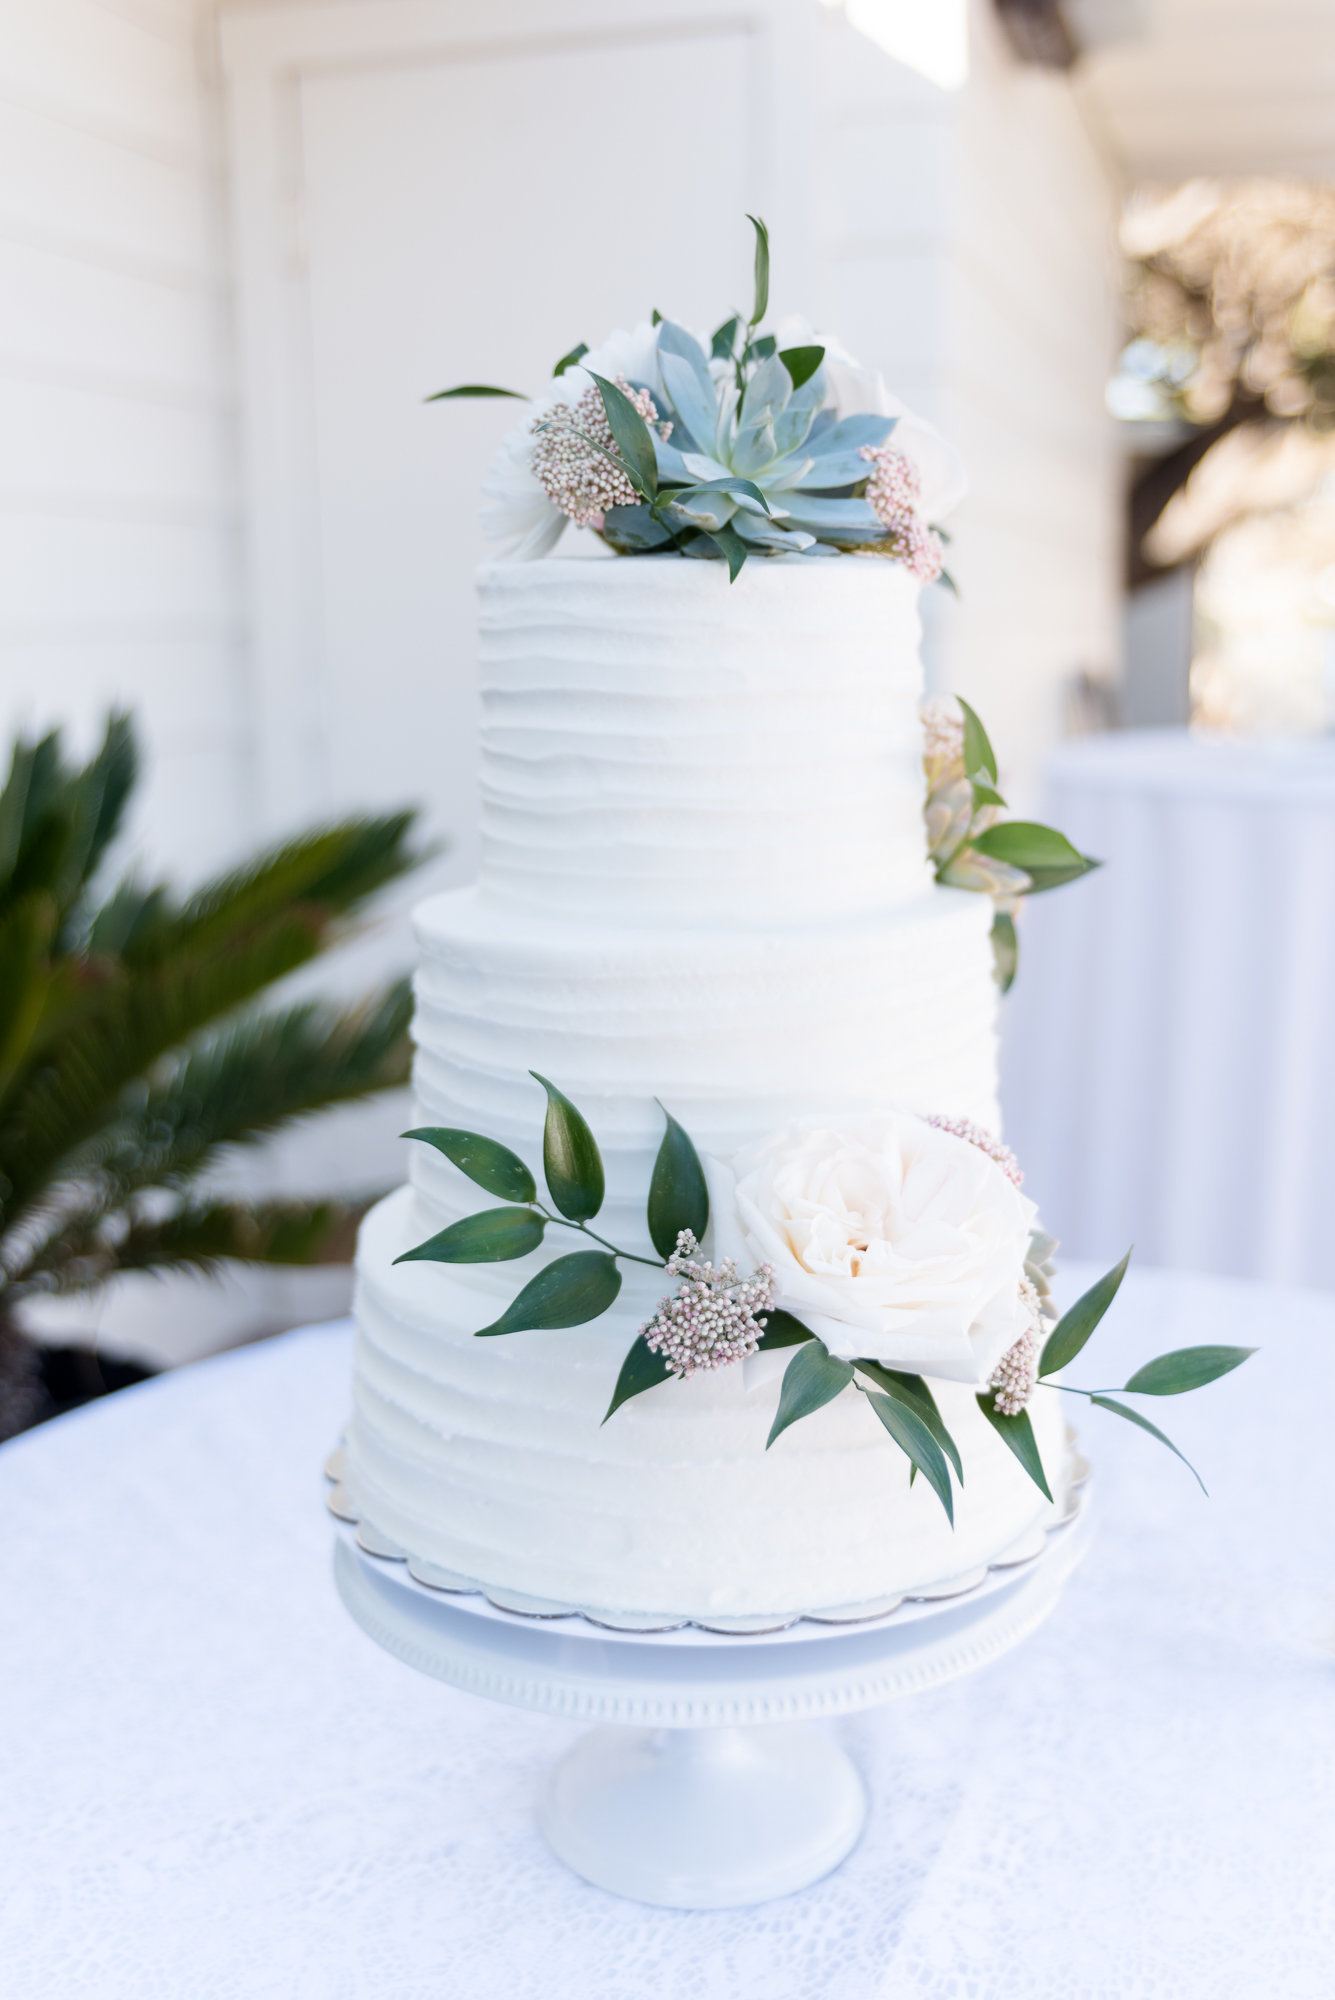 Shari Anne Photography | Southern California Wedding Photographer ...